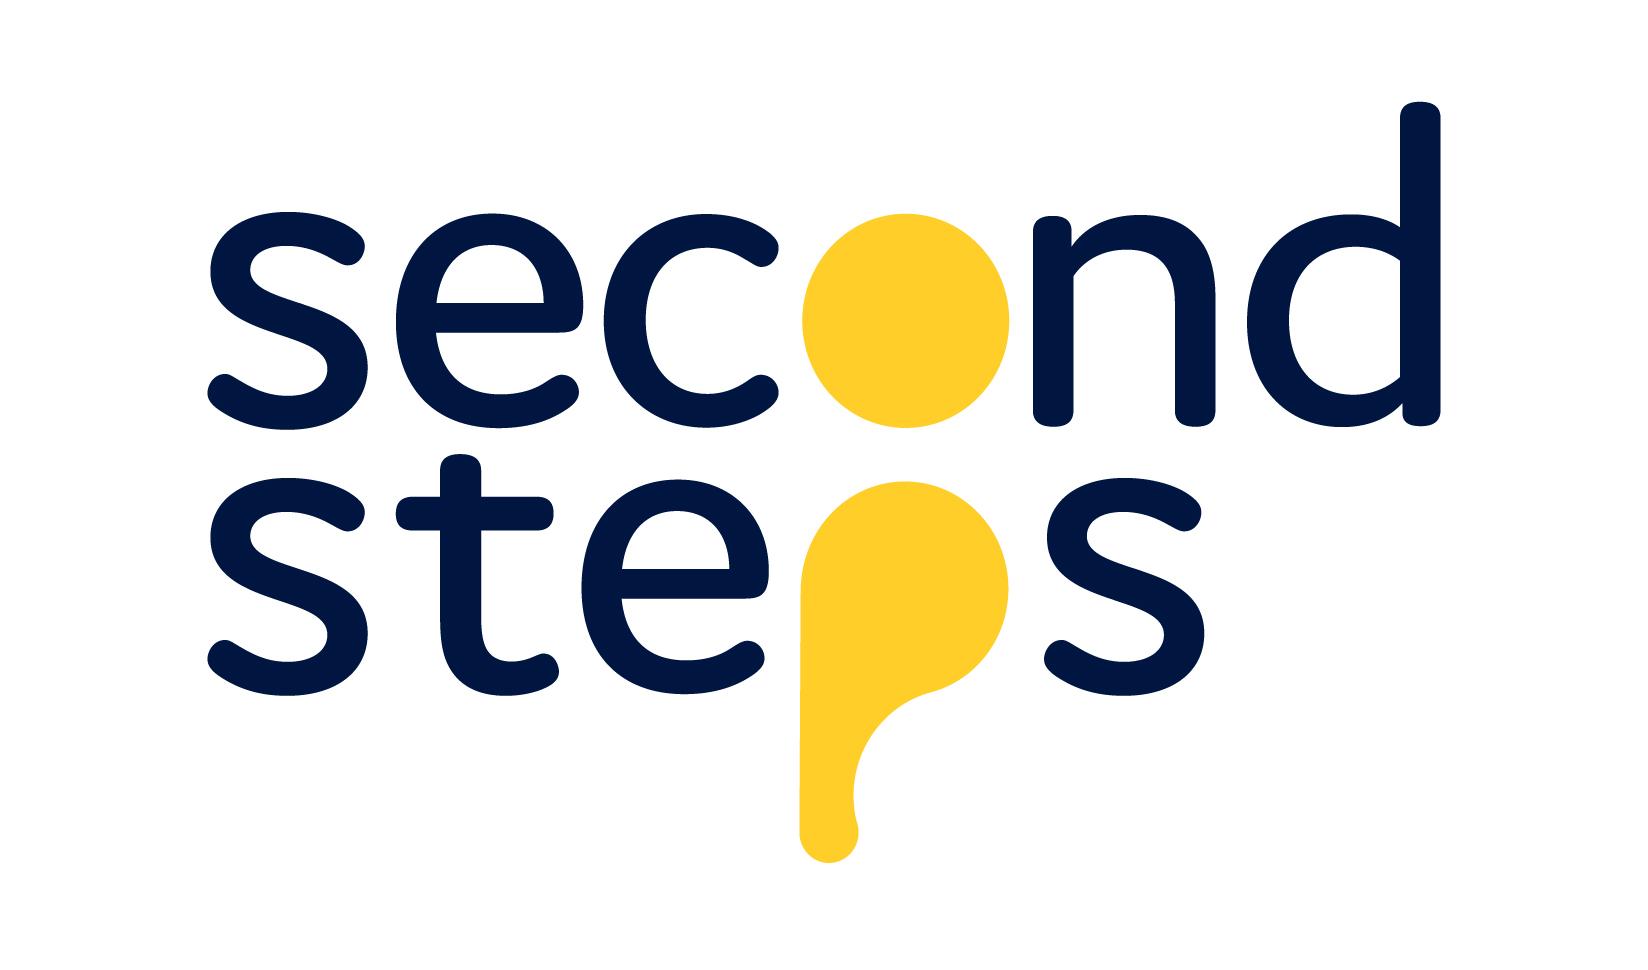 Second Steps logo